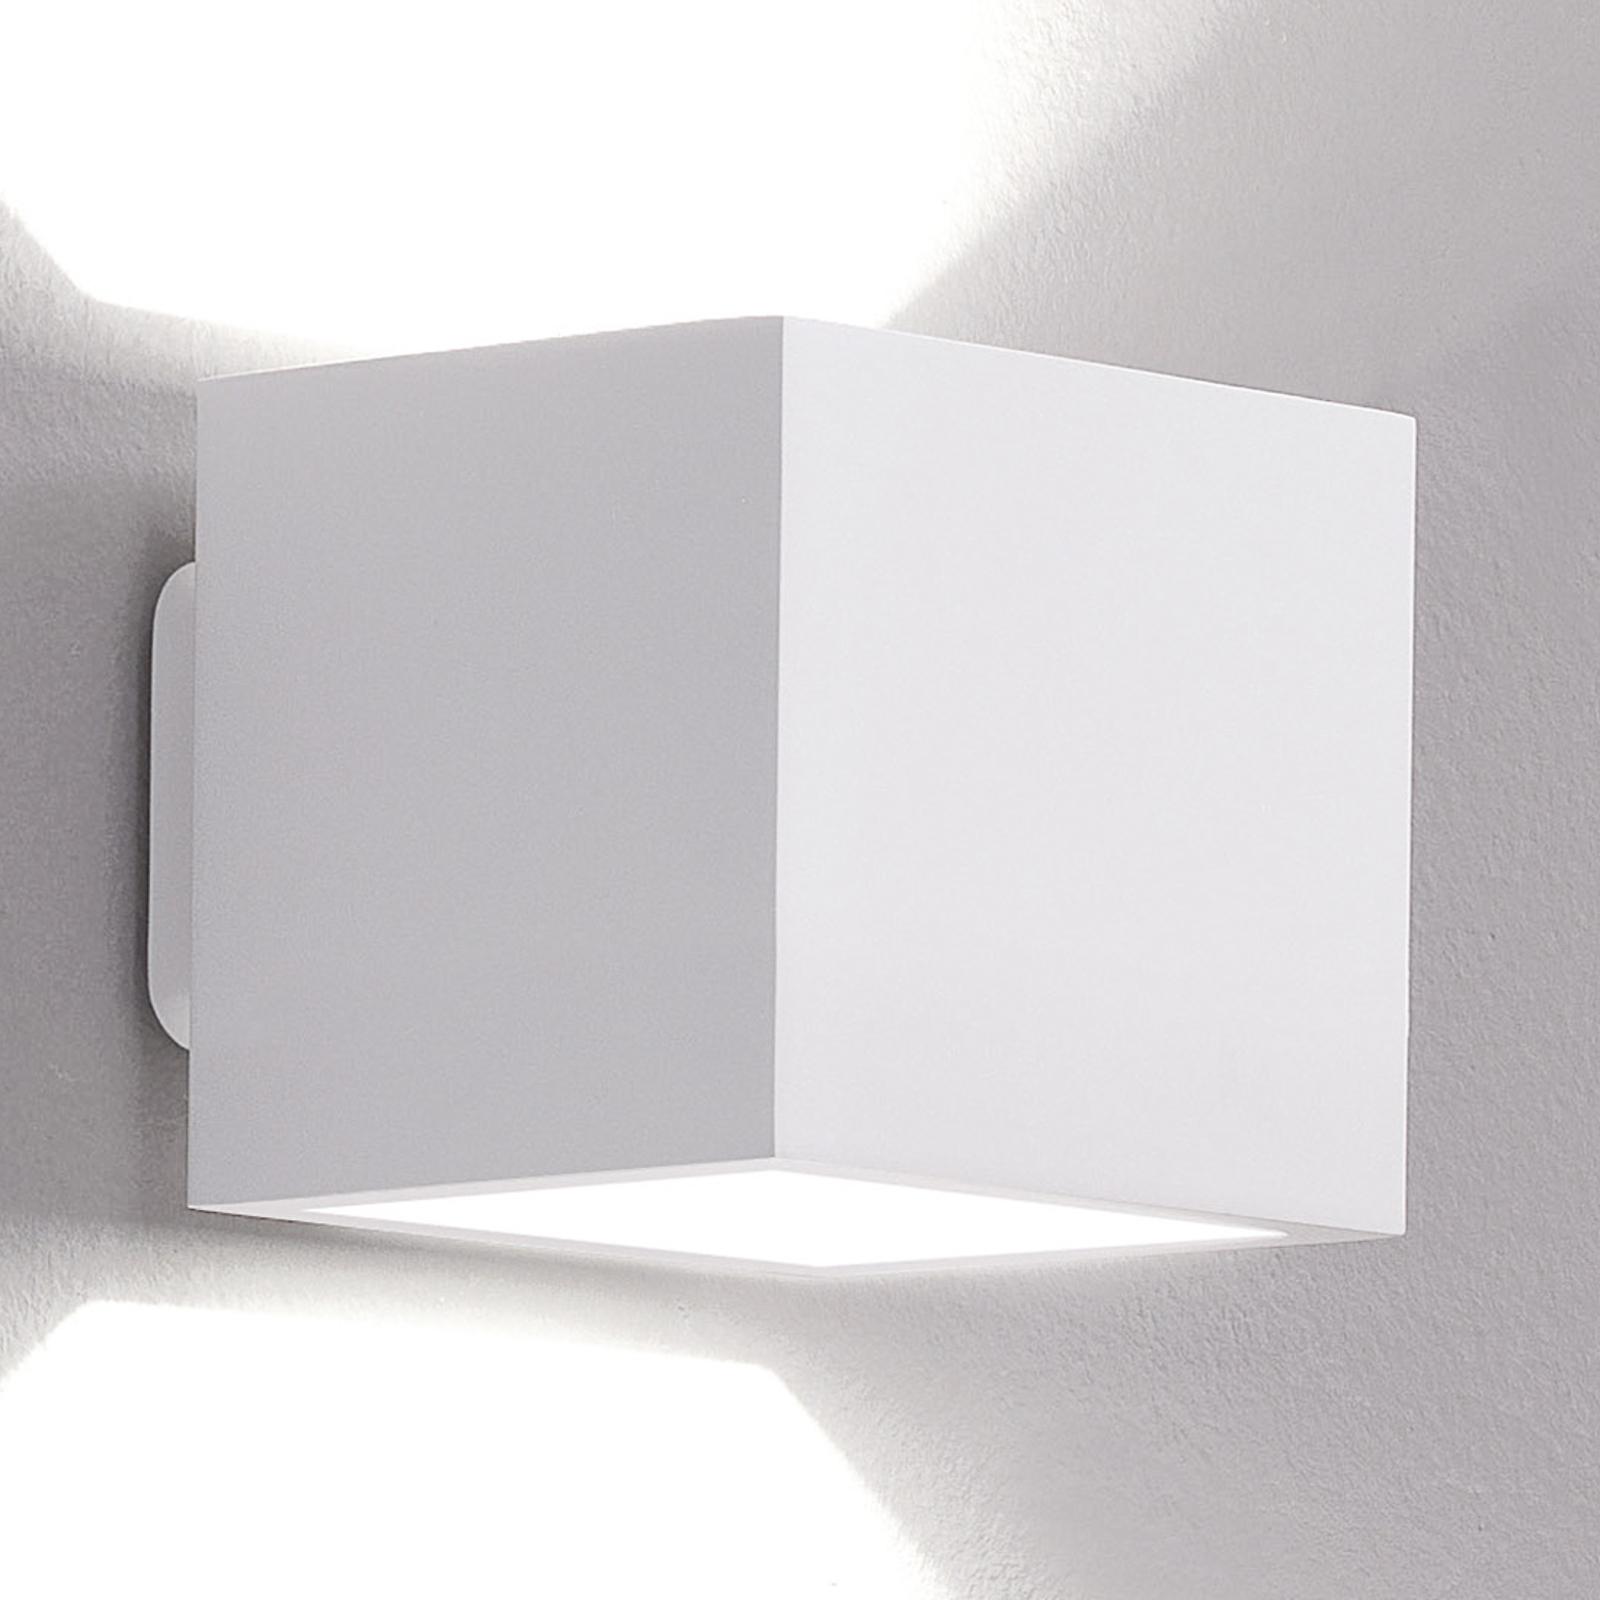 ICONE Cubò LED-Deckenleuchte, 10 W, weiß